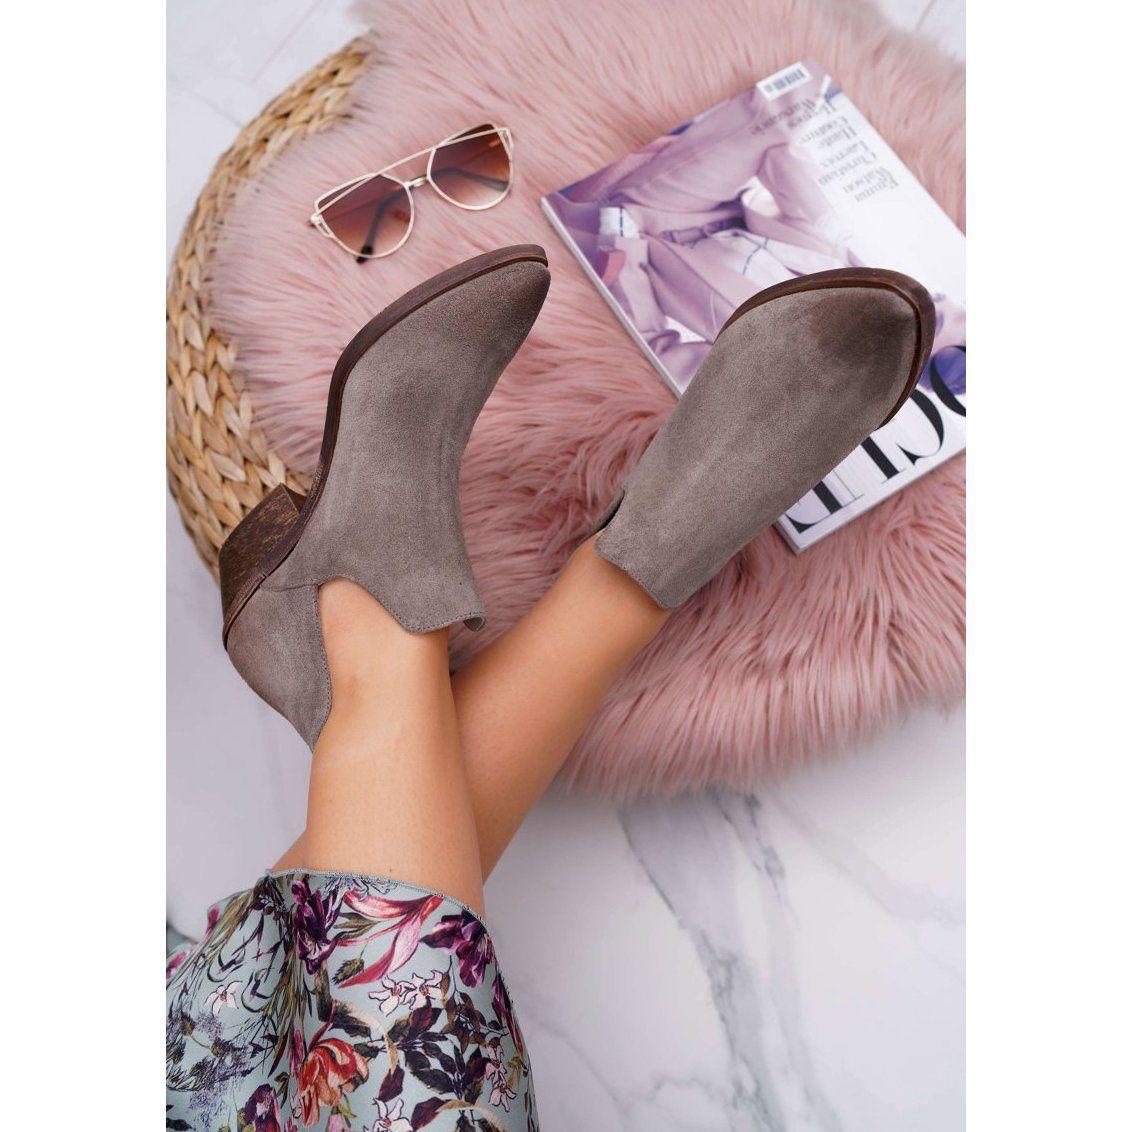 Nicole Botki Damskie Wiosenne Skorzane Cappuccino Anabella Bezowy In 2020 Heels Sandals Heels Shoes